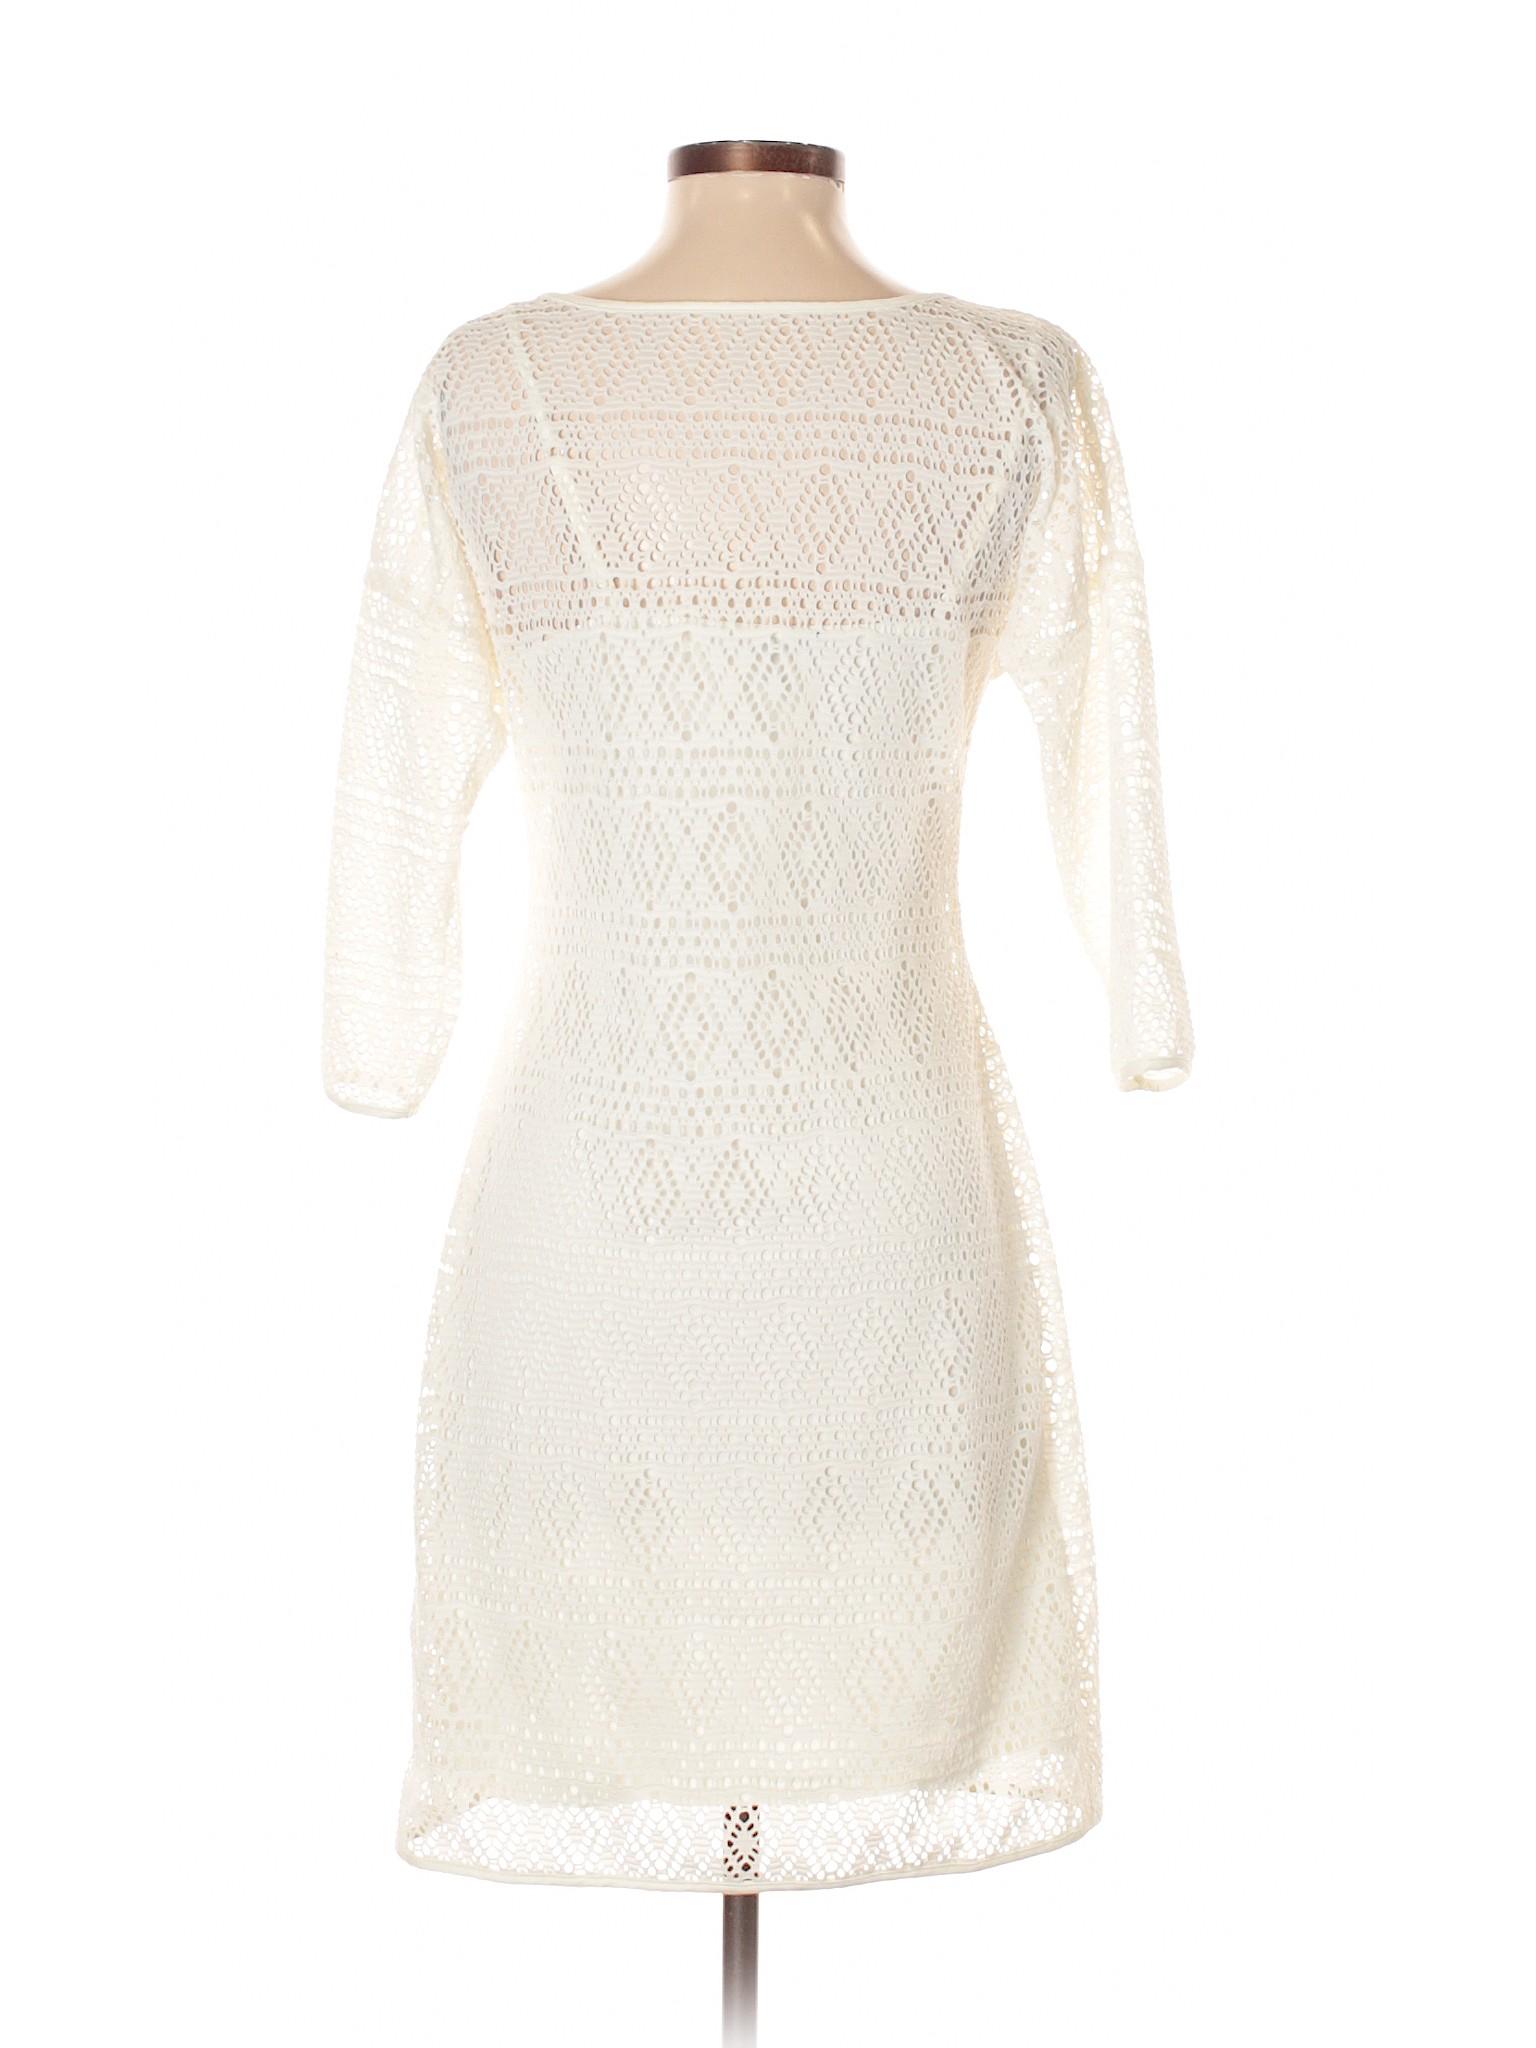 Casual Winter Express Boutique Express Dress Winter Boutique w1A8zcKqXf